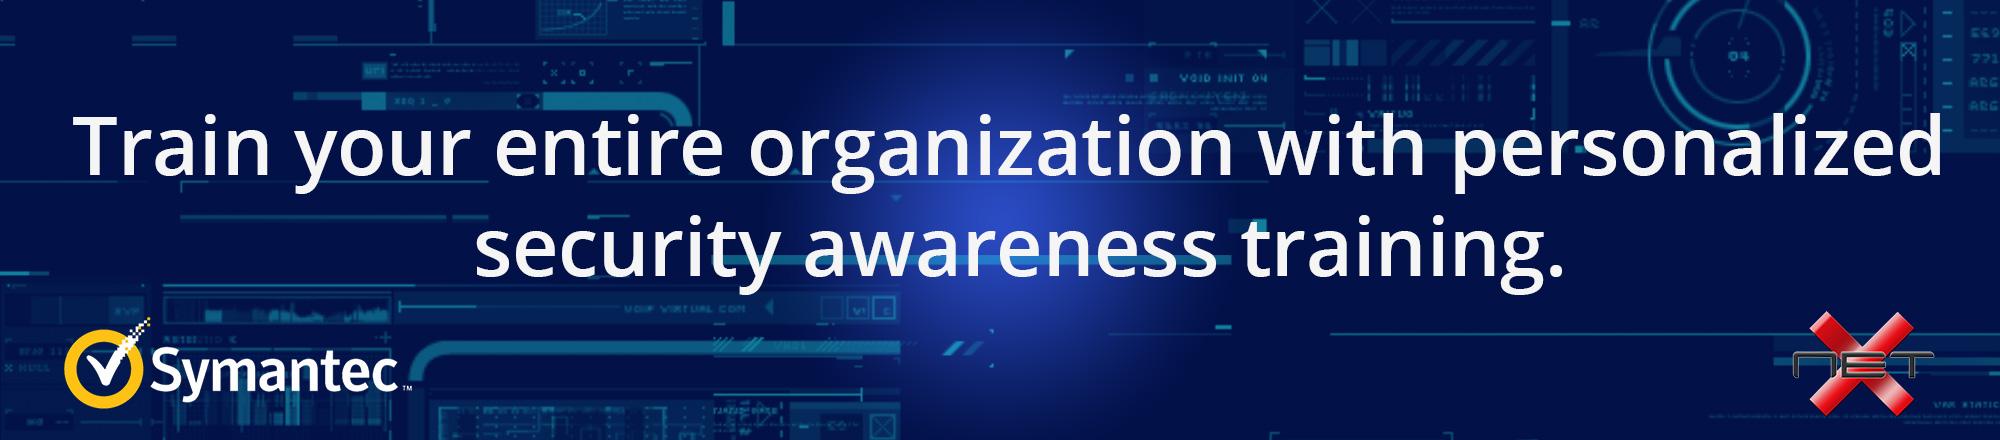 security awareness training--train your entire organization symantec netx banner